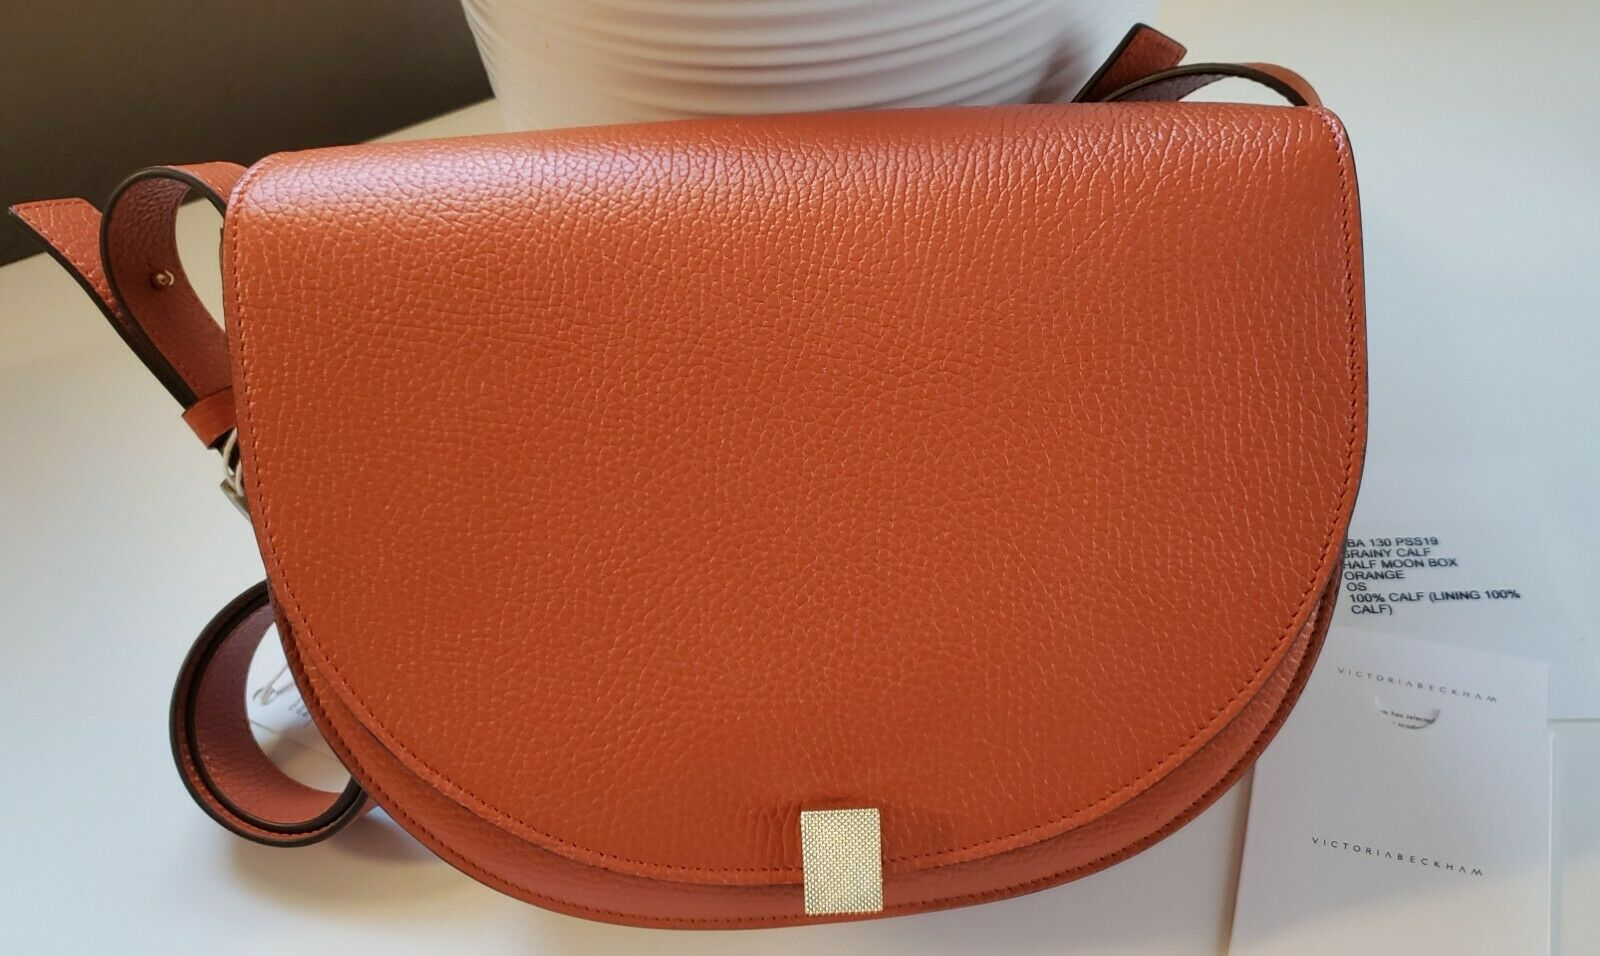 NWT VICTORIA BECKHAM Half Moon Box Pebbled Leather Shoulder Bag -Orange